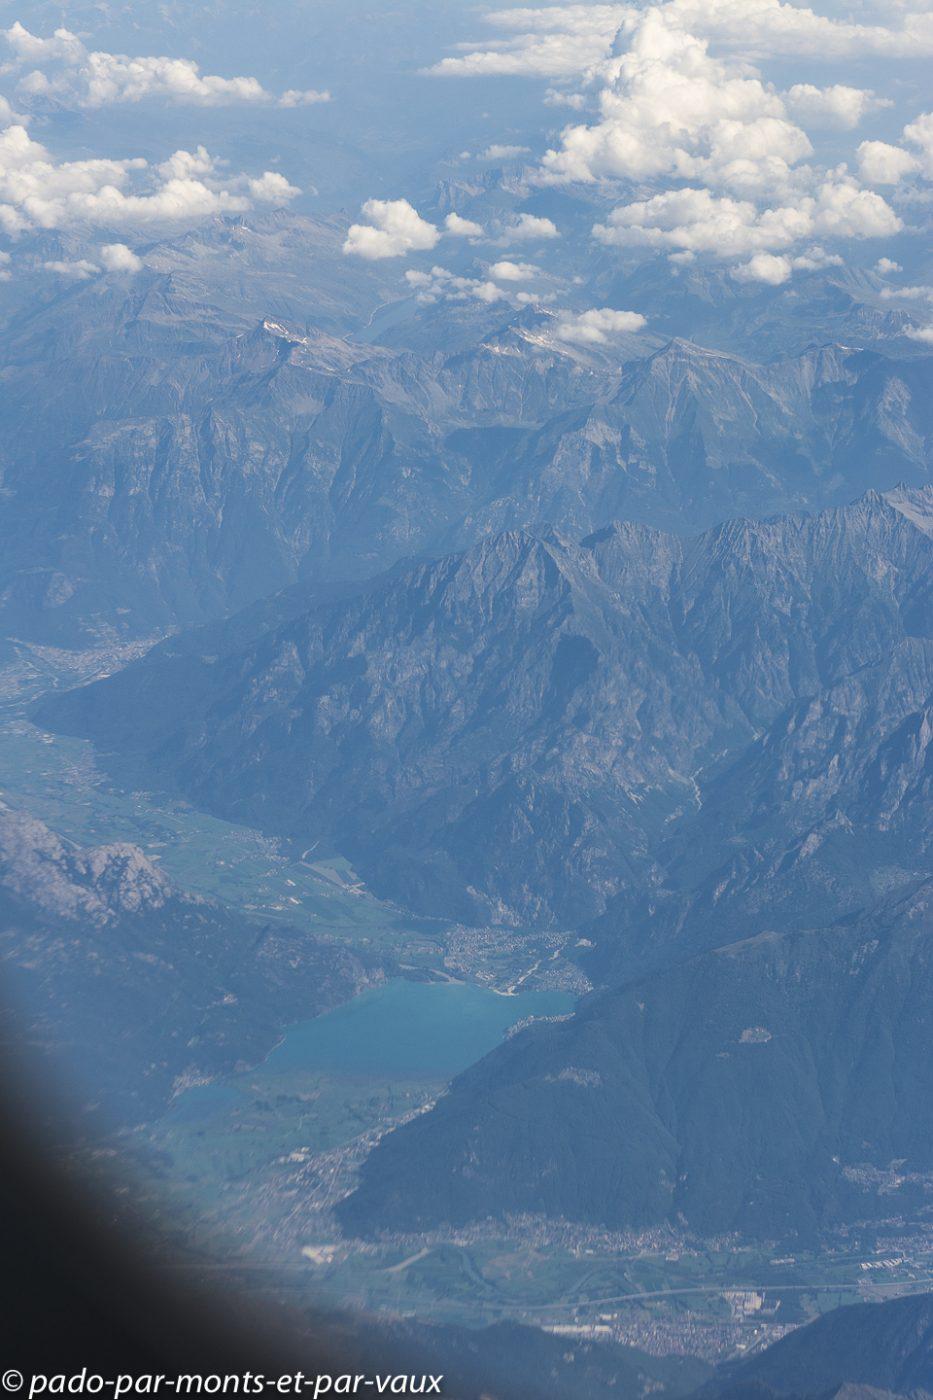 Survol des Alpes Suisses